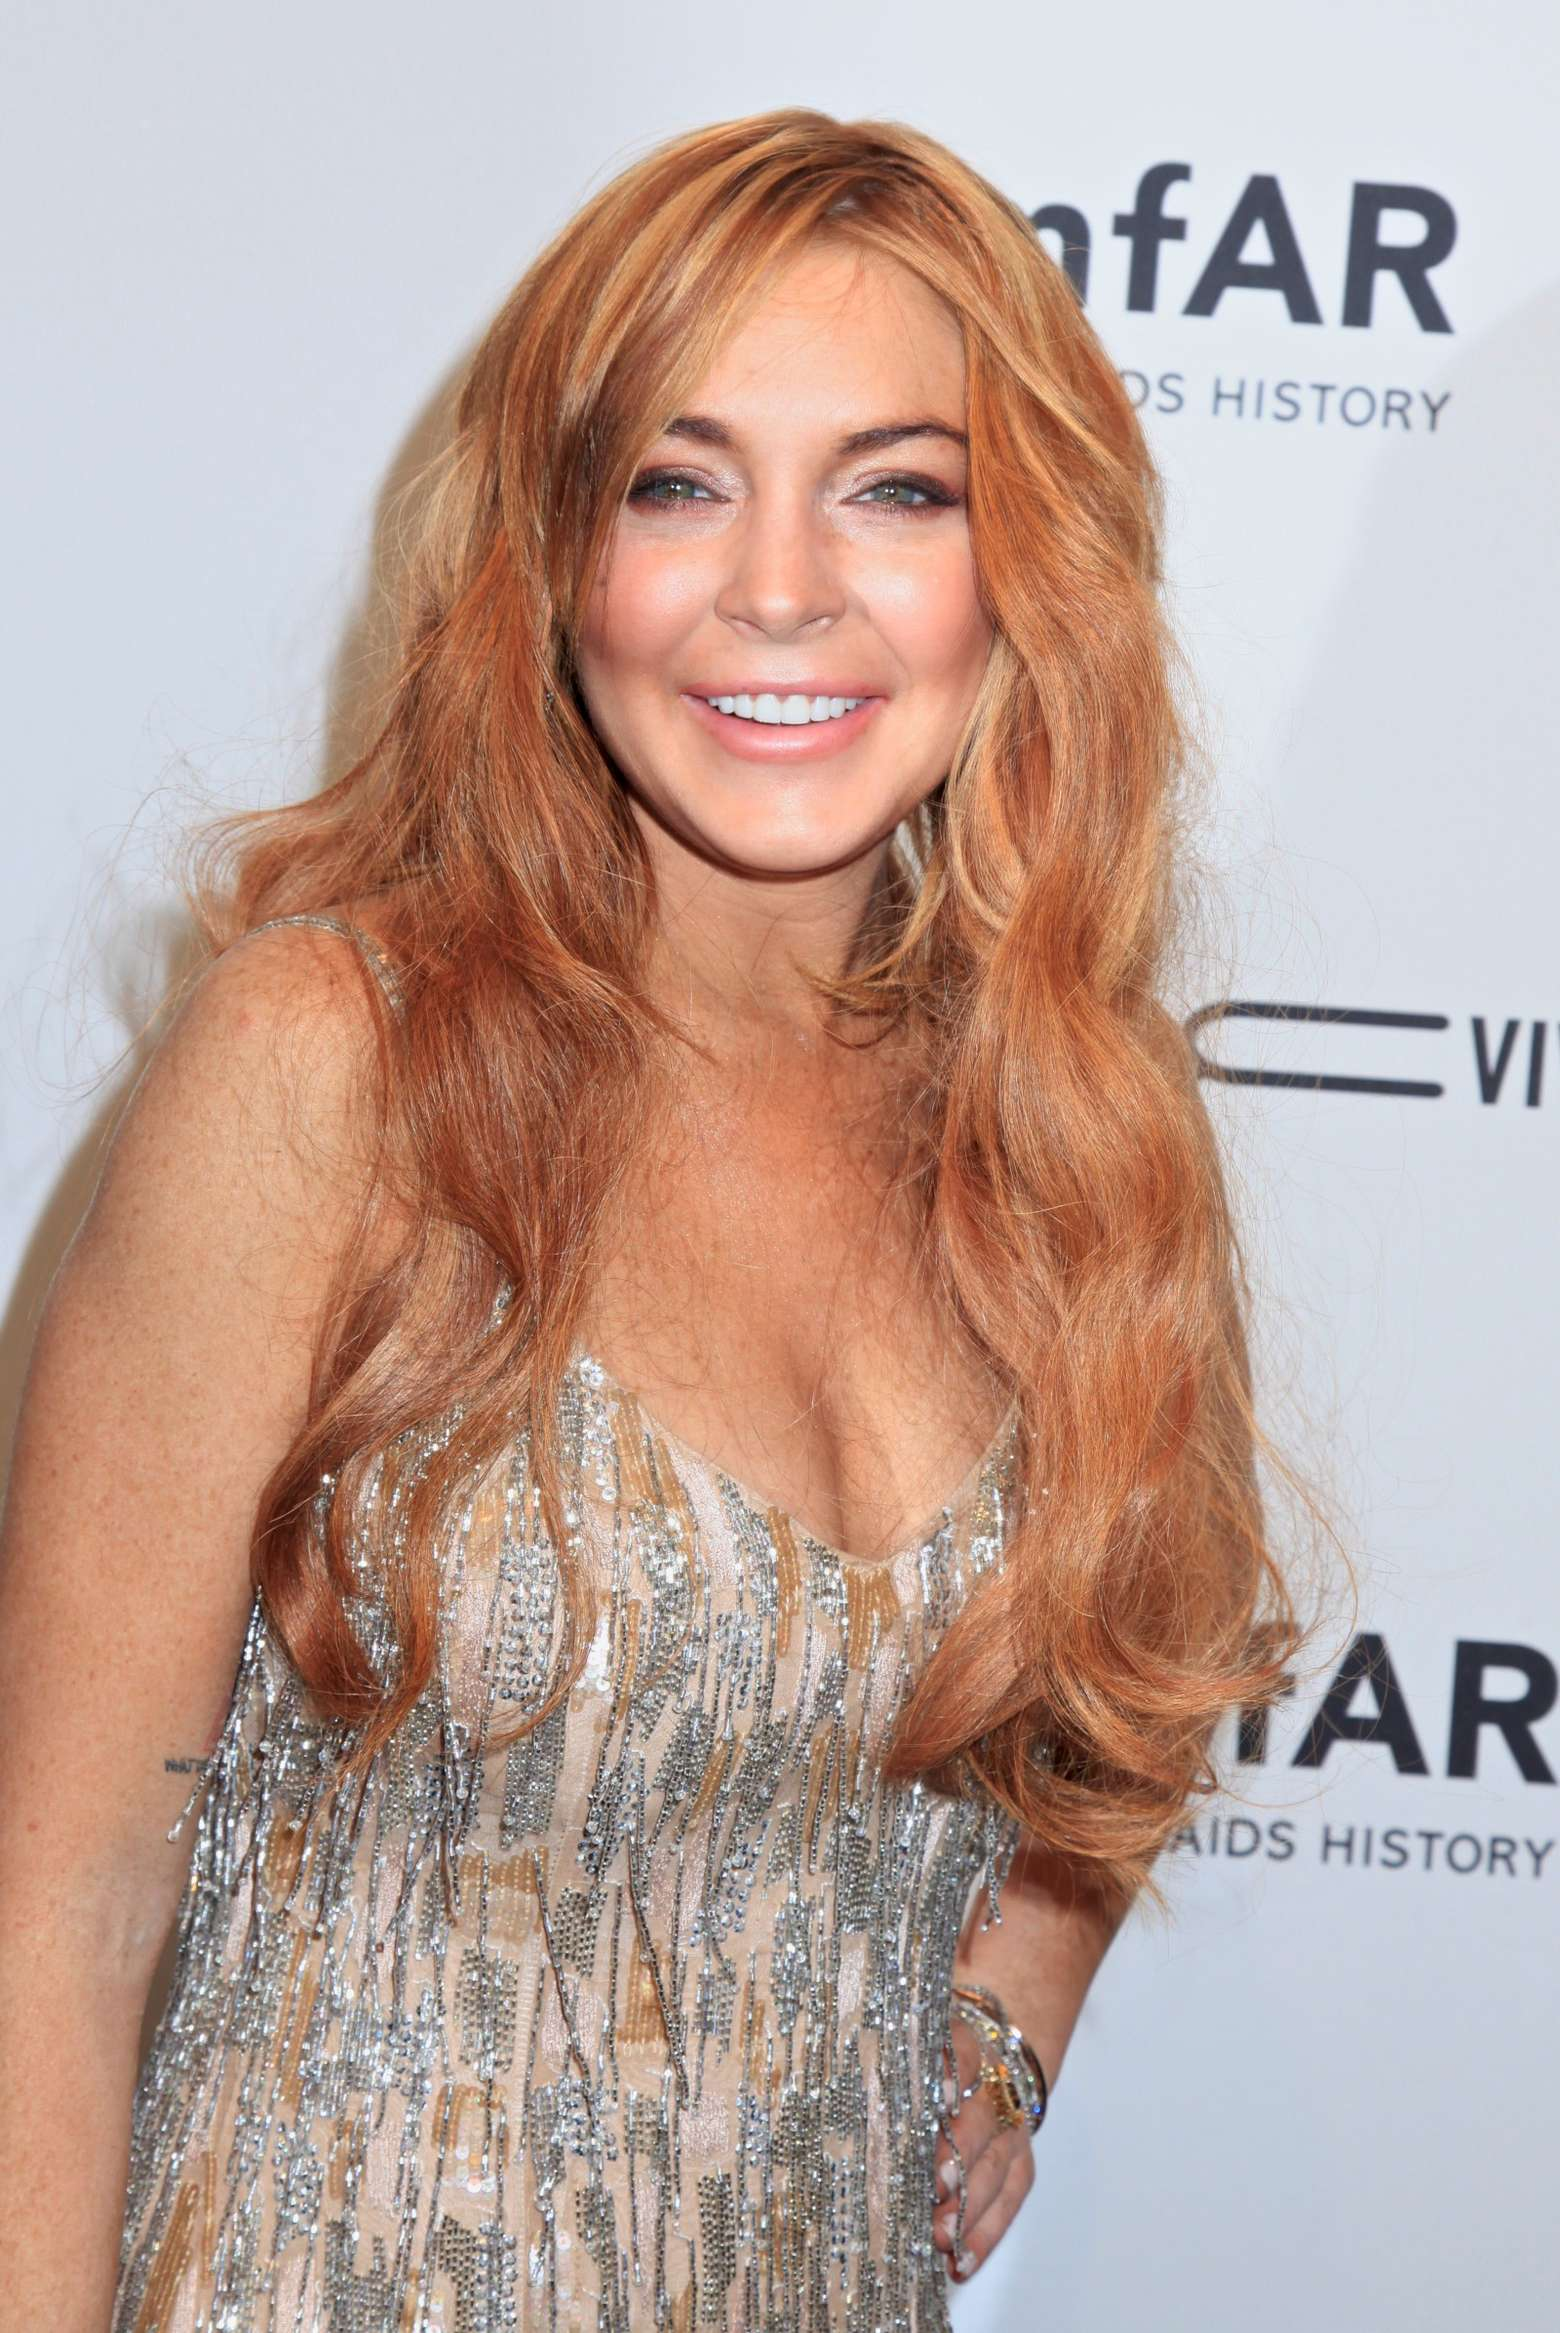 Lindsay Lohan - 2013 amfAR New York Gala-05 - GotCeleb Lindsay Lohan